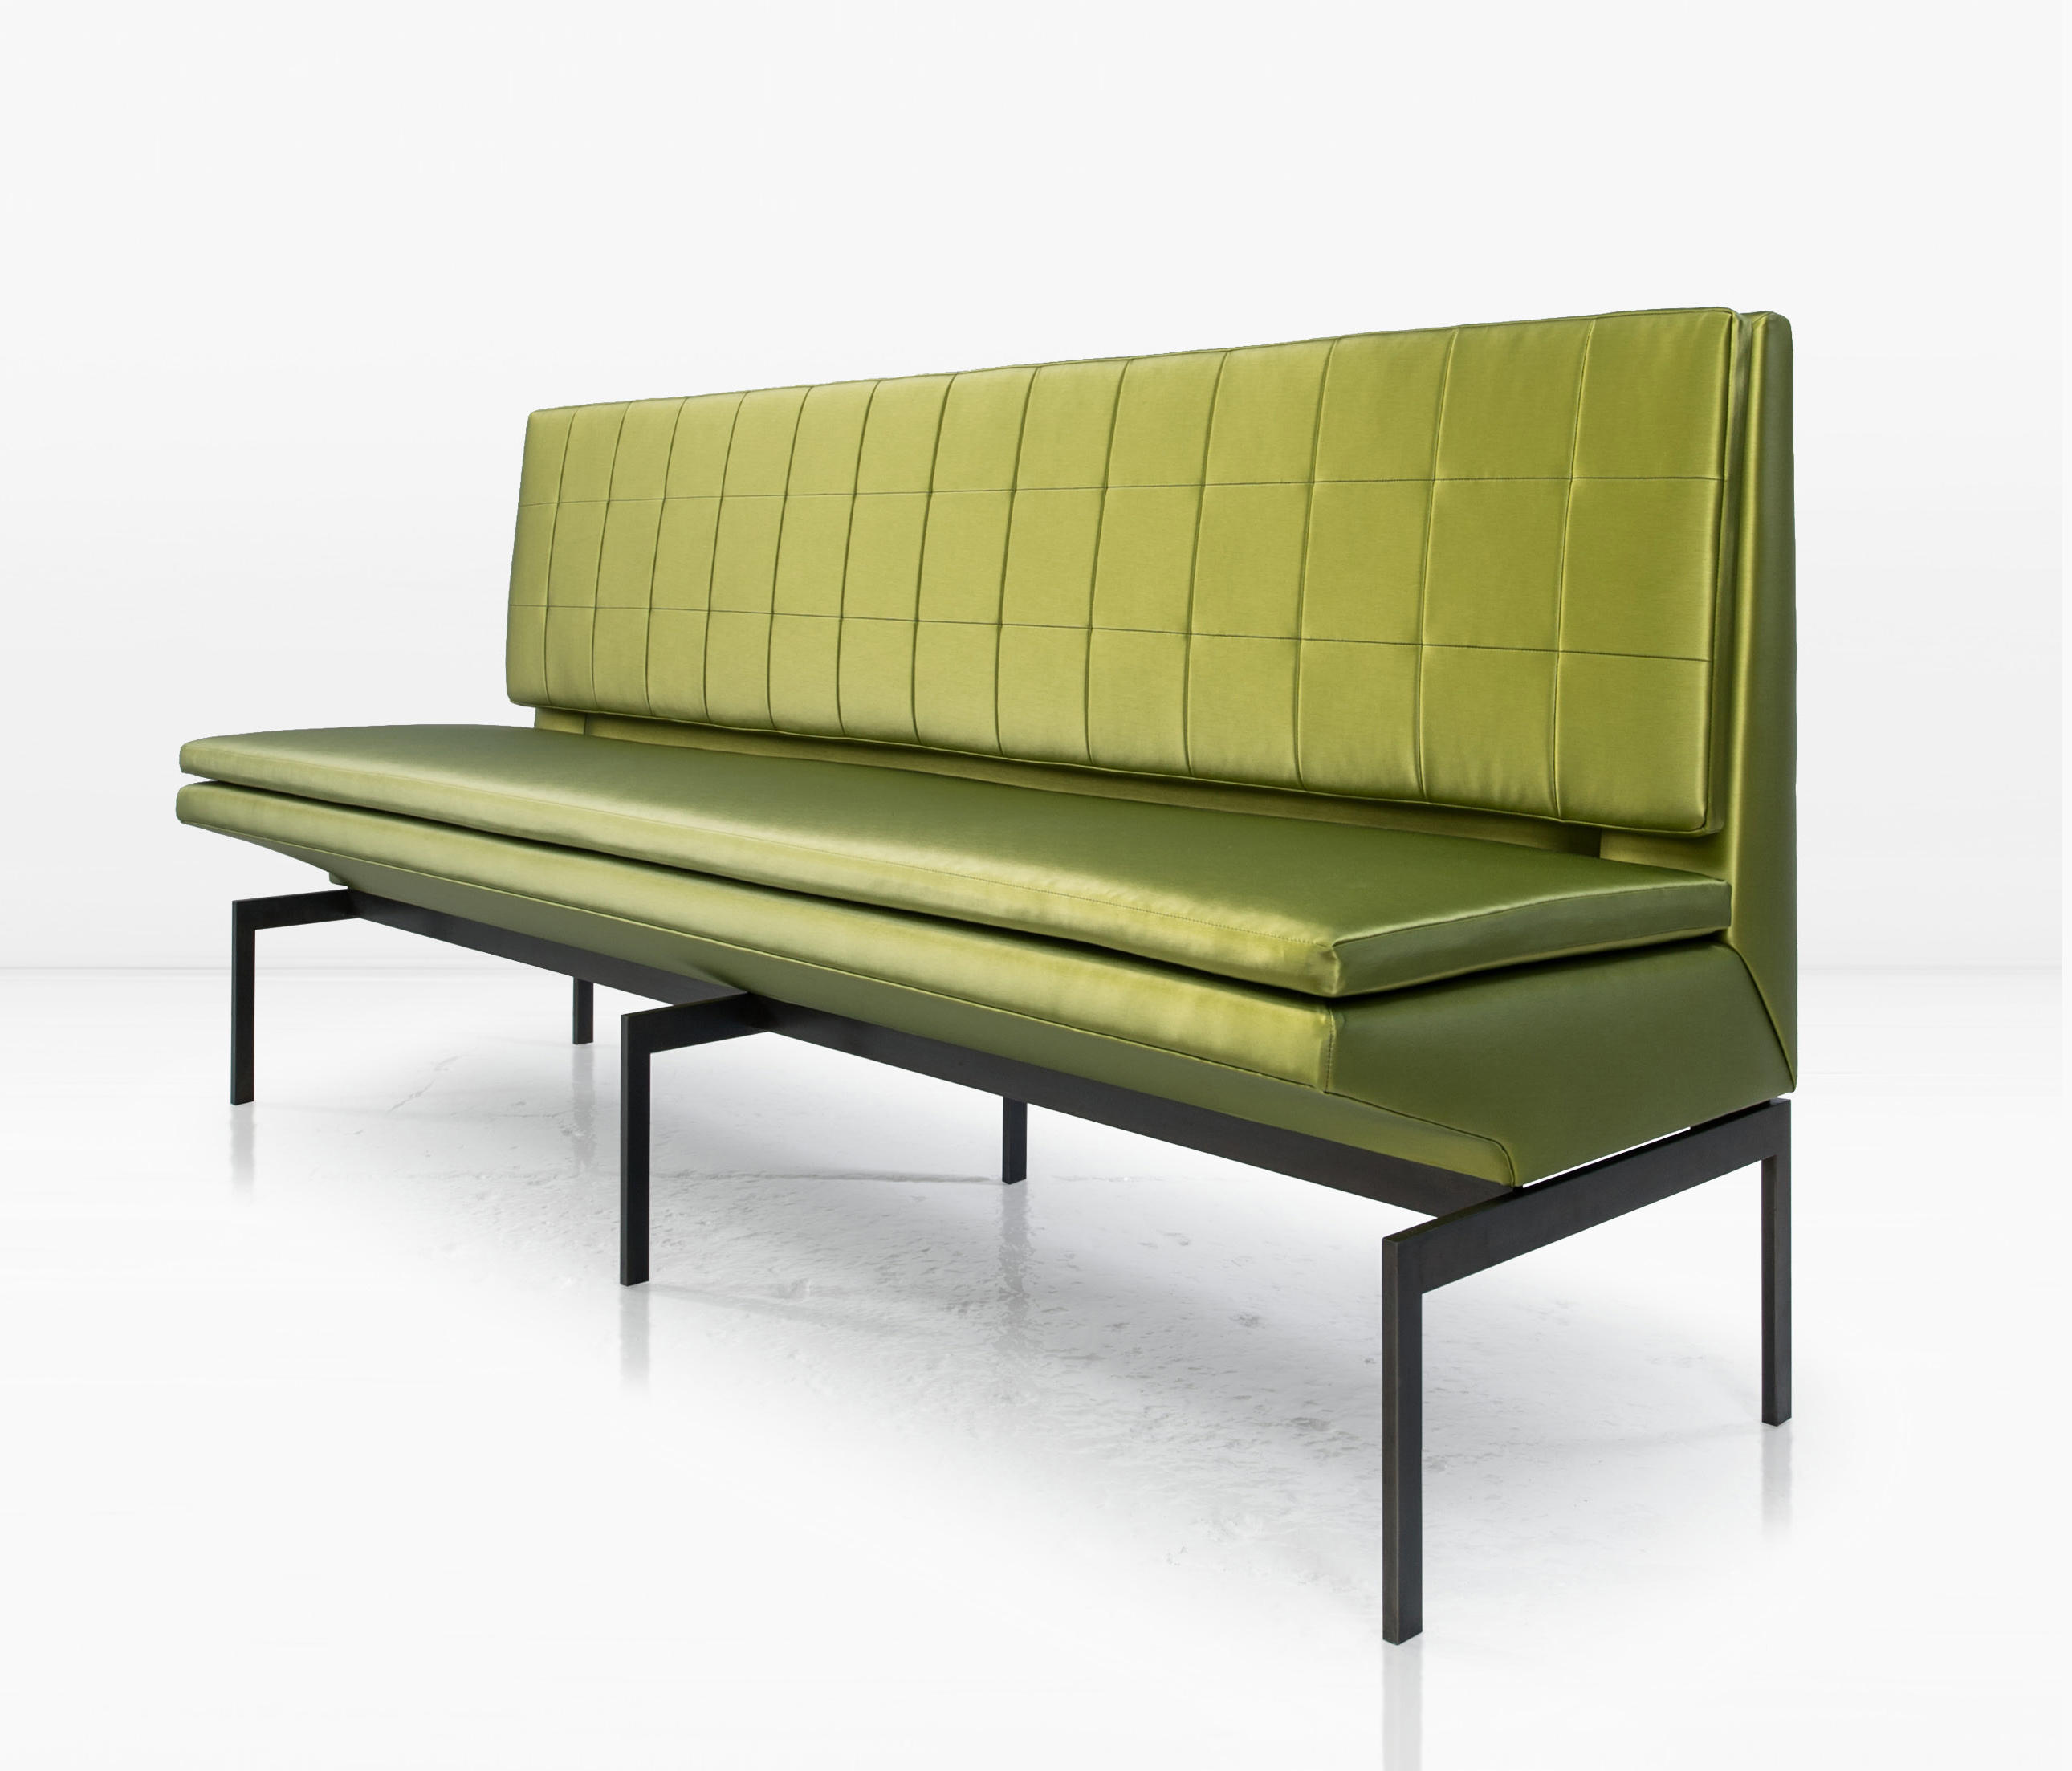 Mancini Banquette By Khouri Guzman Bunce Lininger | Waiting Area Benches ...